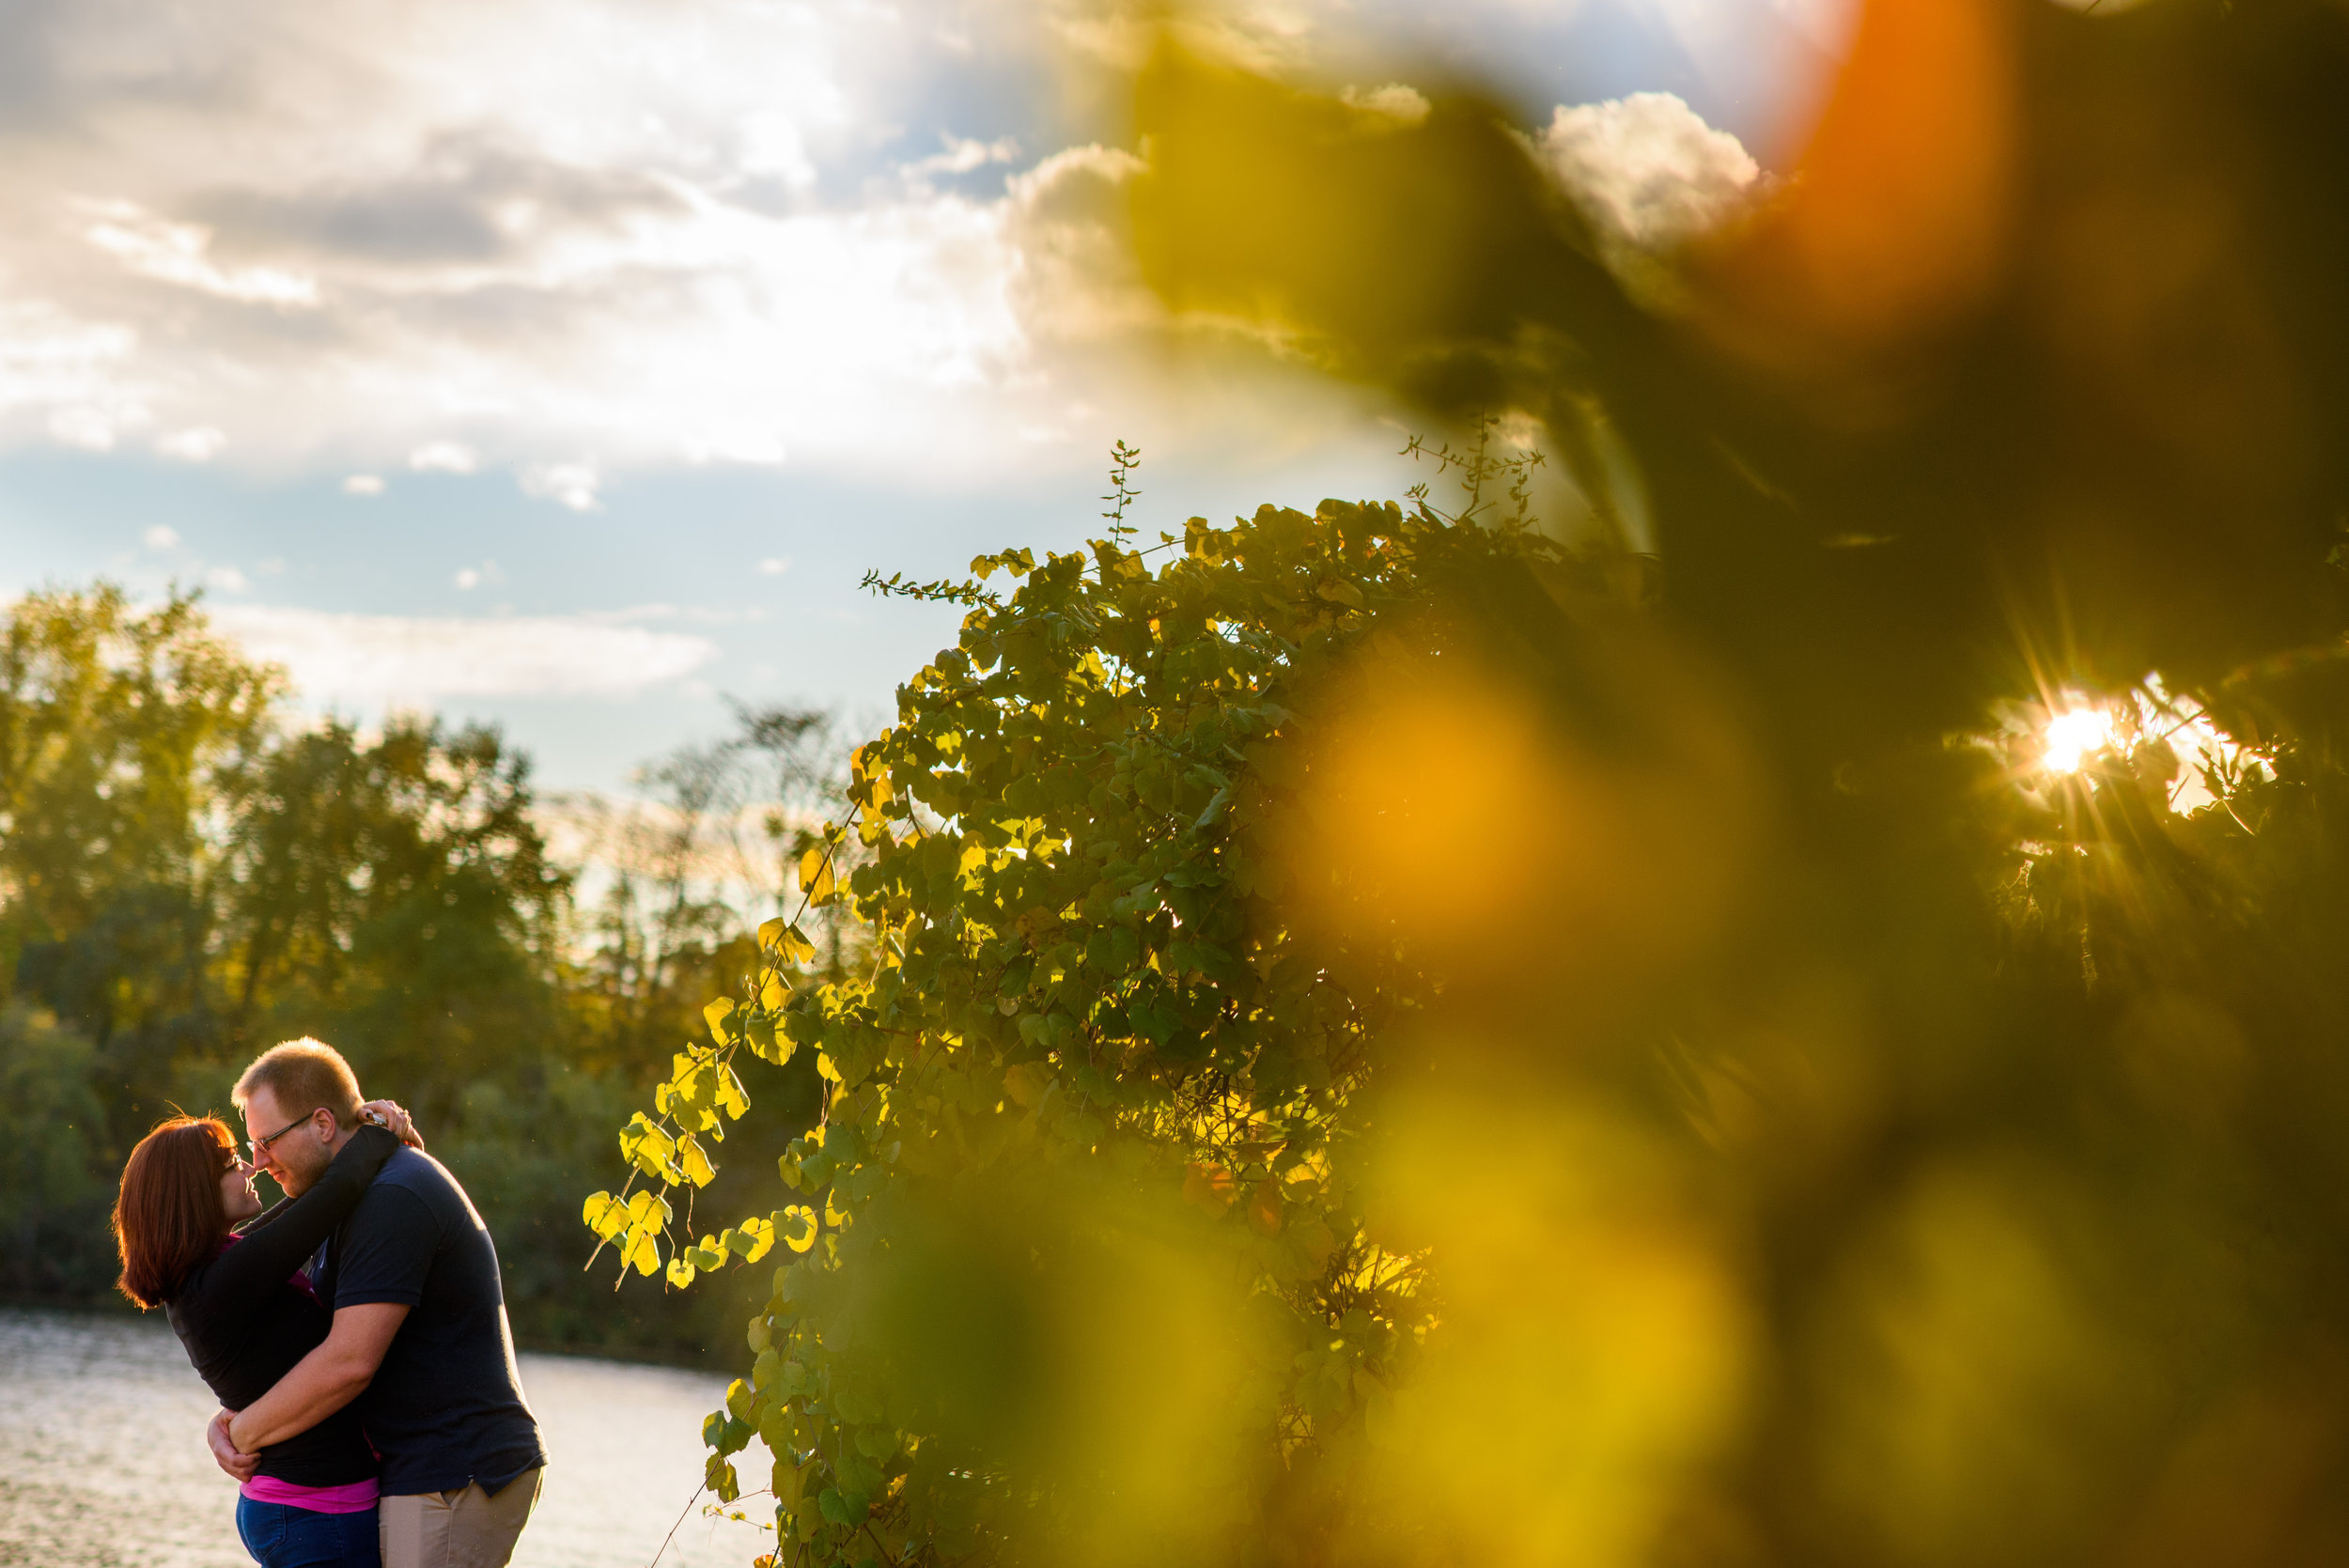 judith-john-008-sacramento-engagement-wedding-photographer-katherine-nicole-photography.JPG